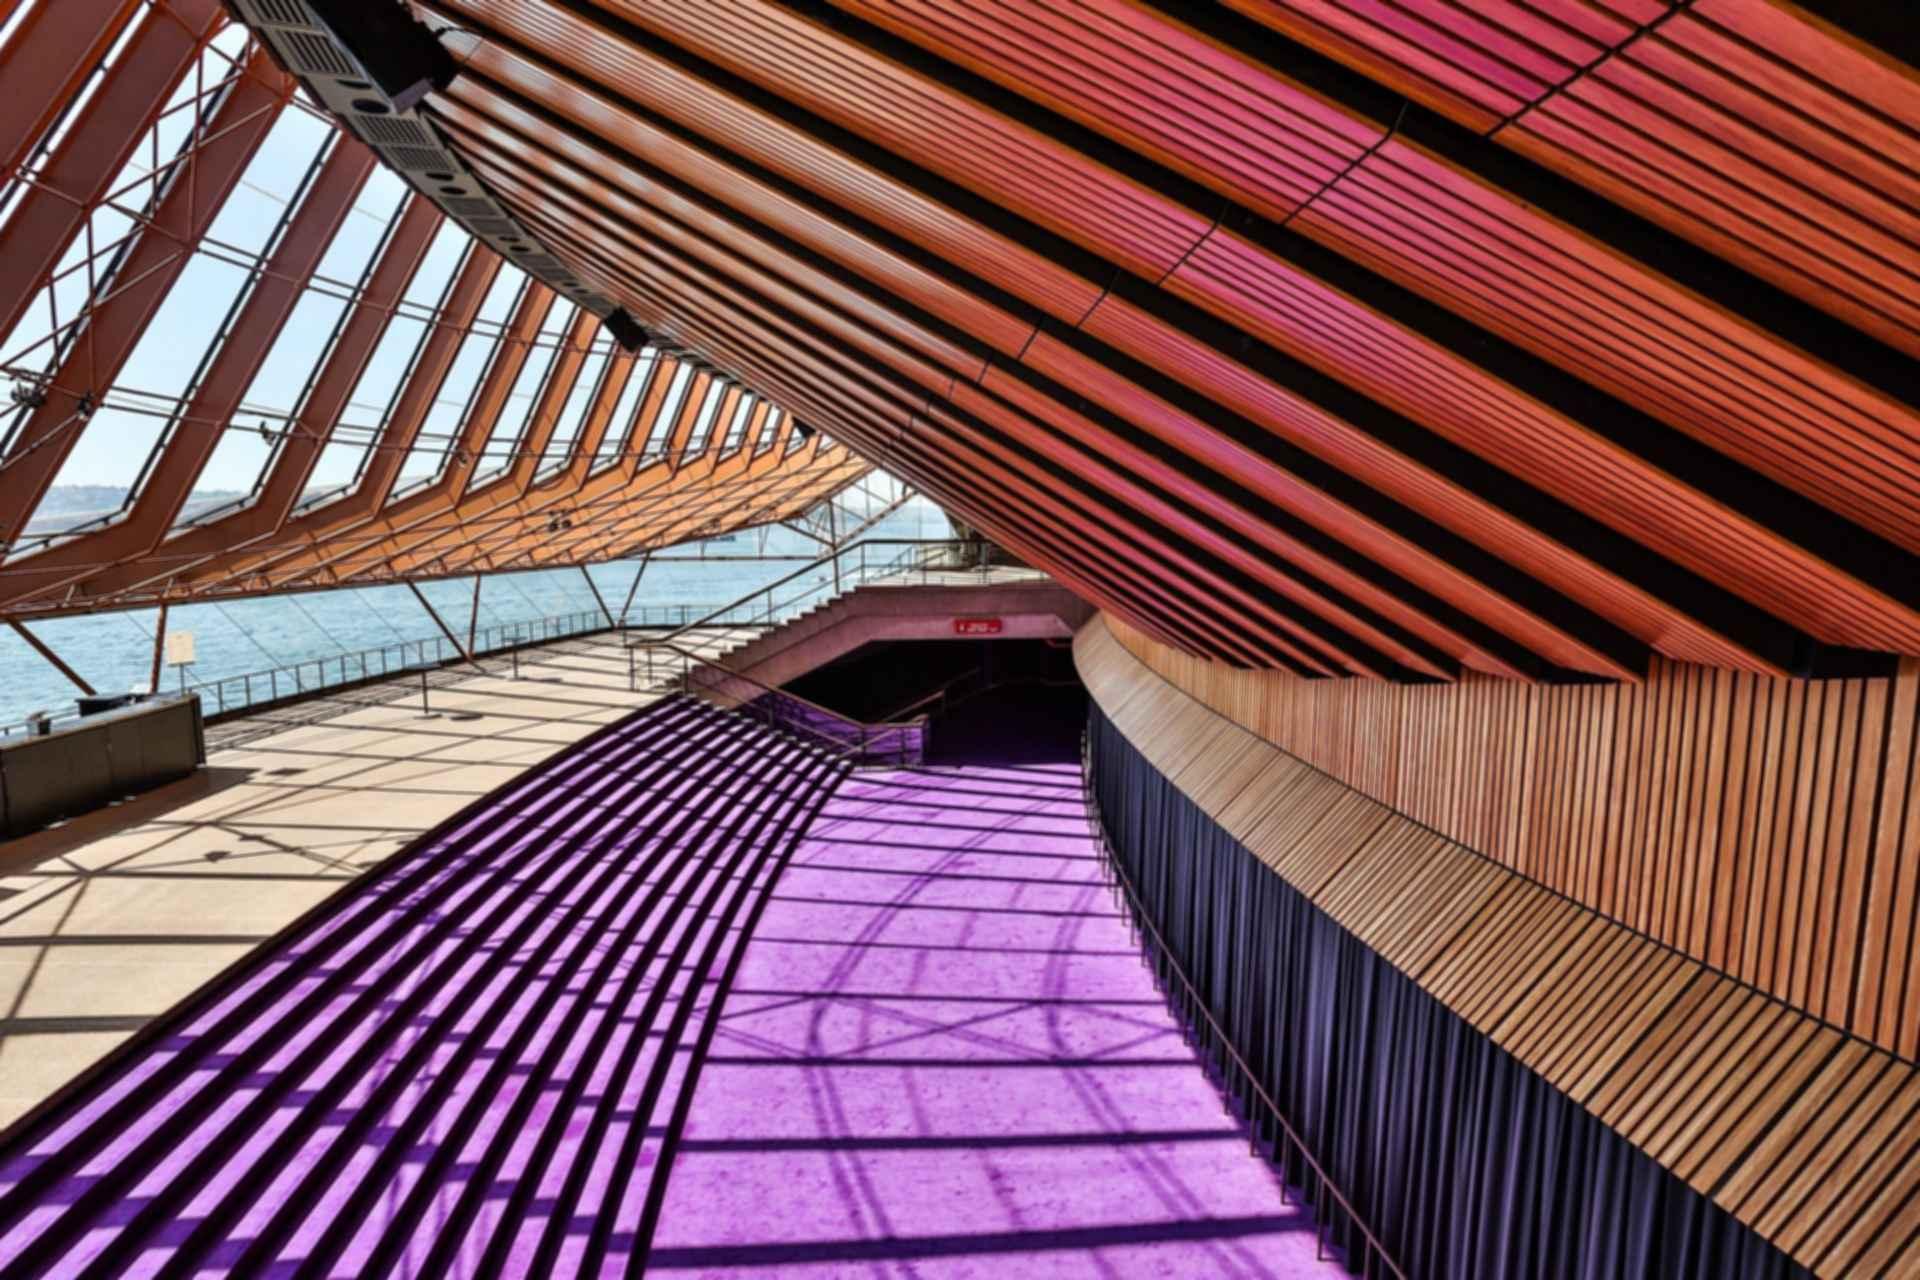 Sydney Opera House - Interior Ceiling